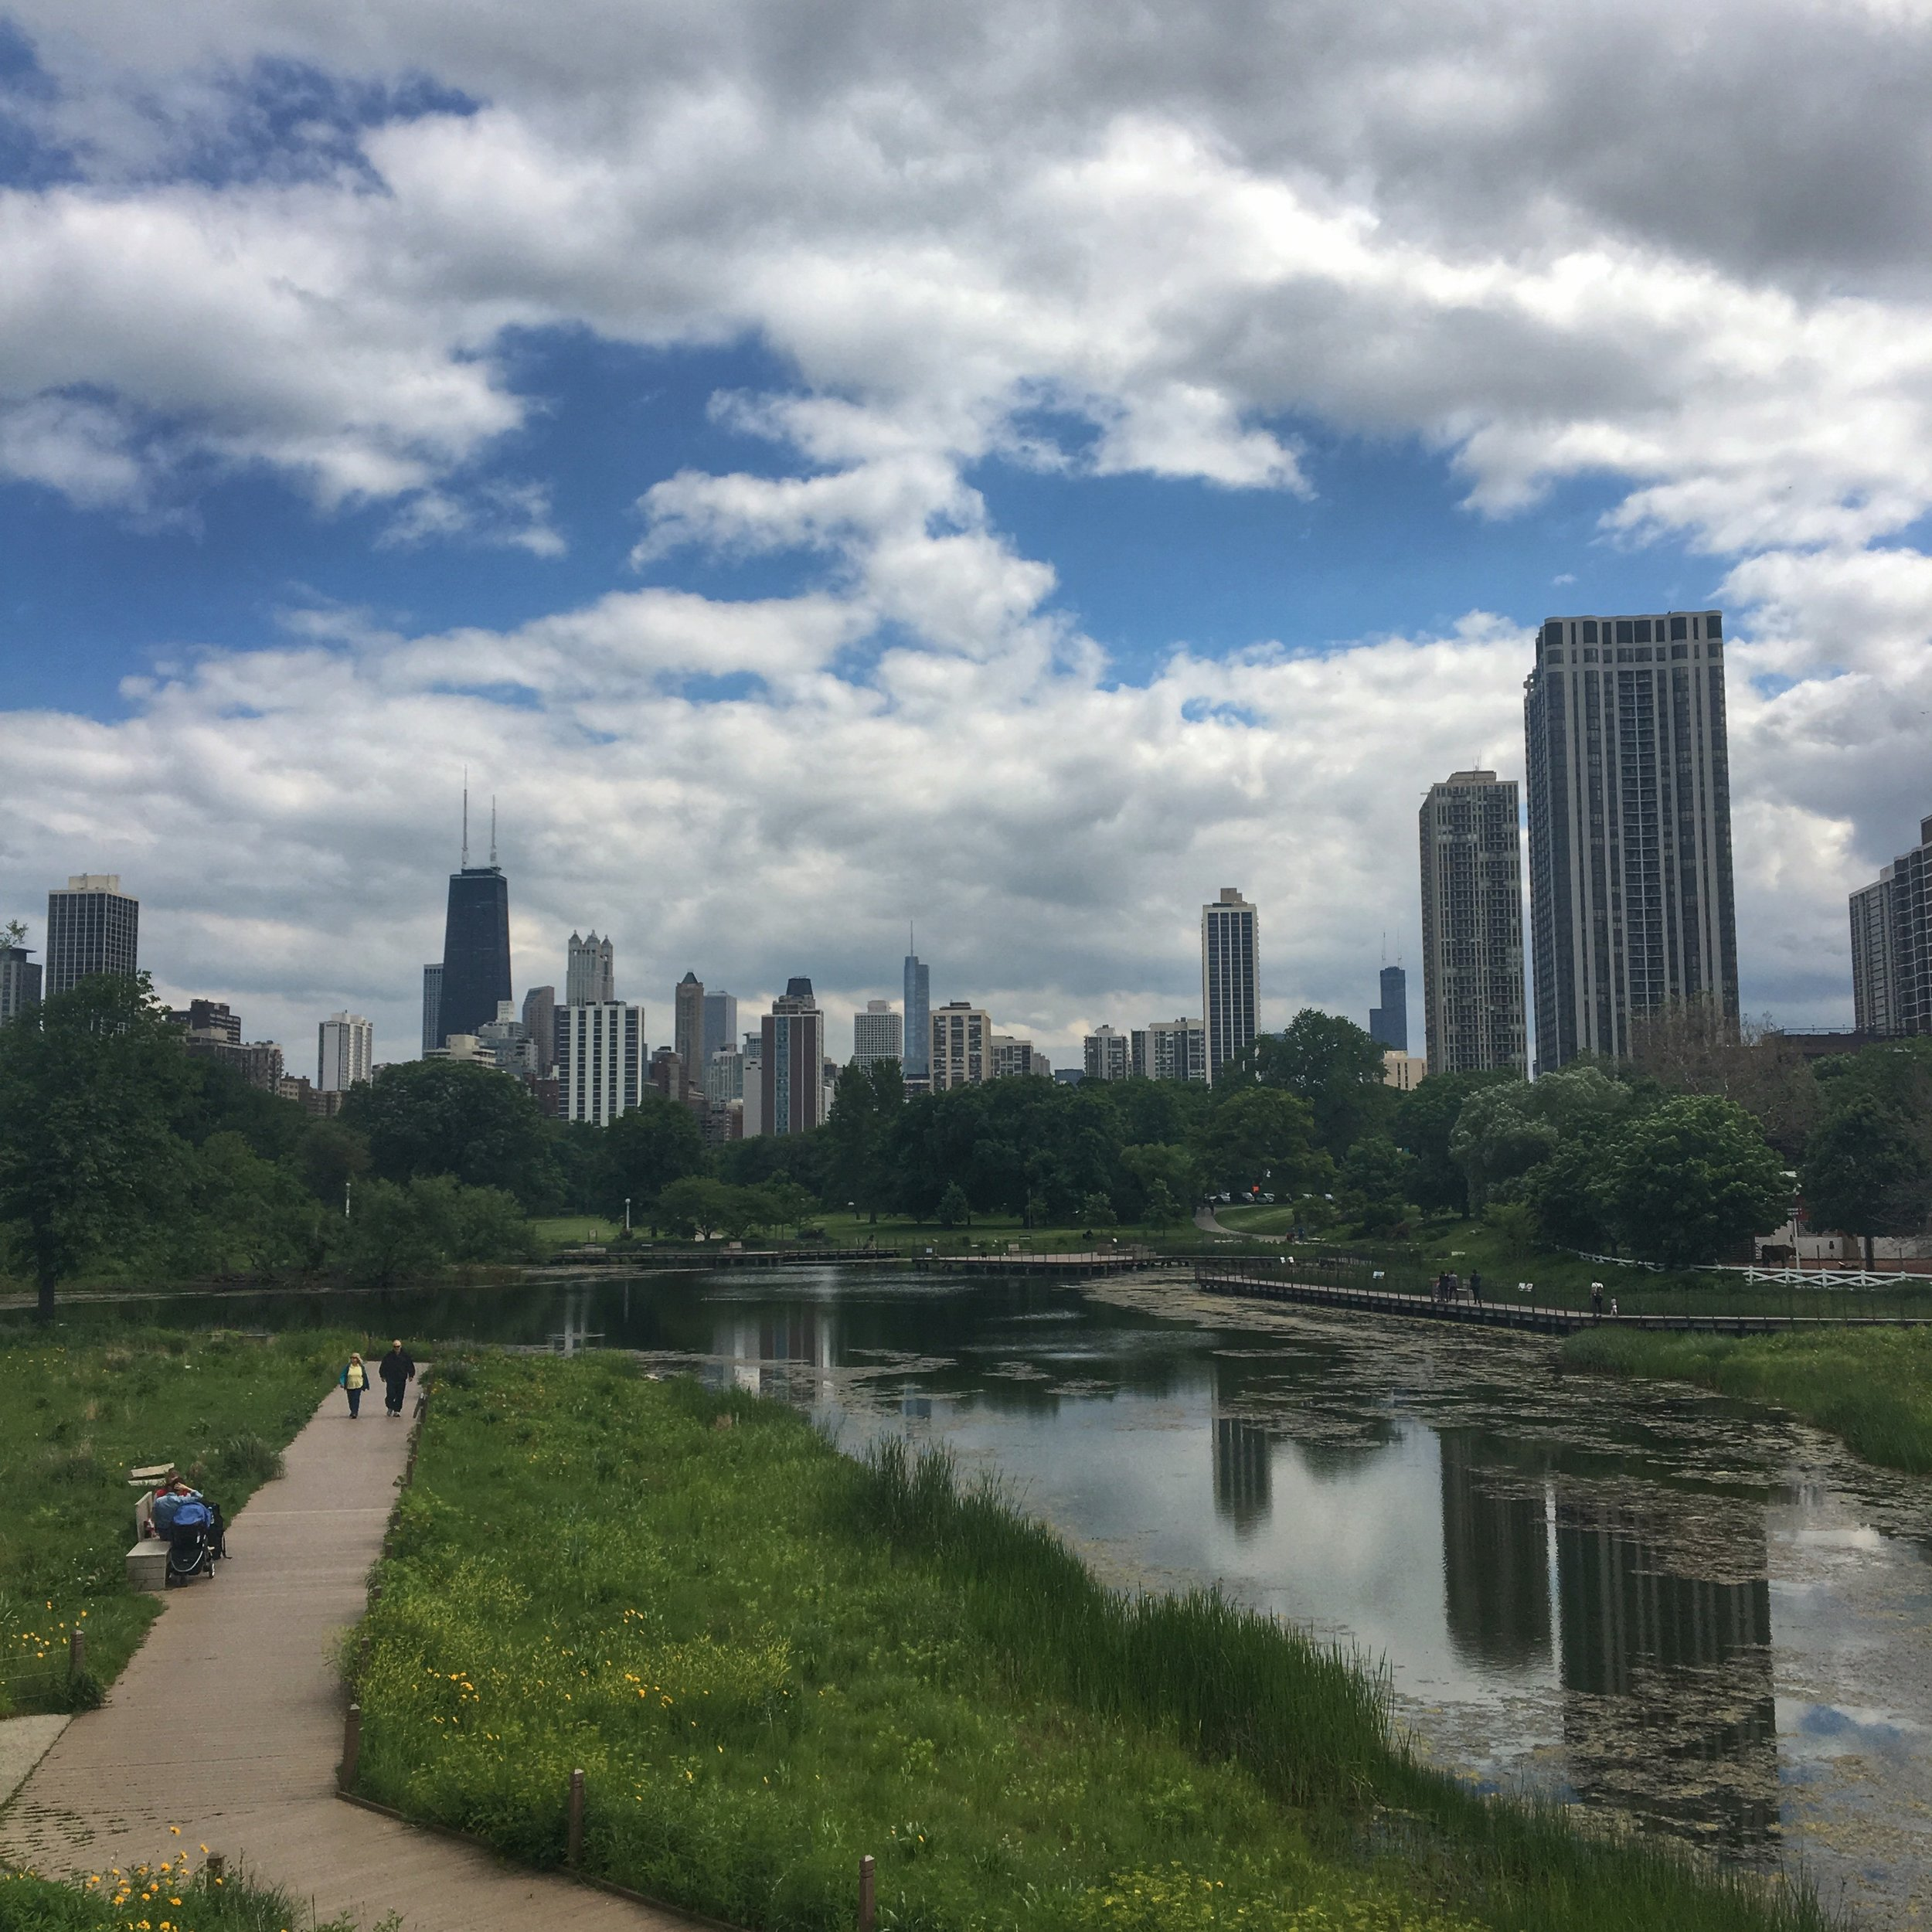 chicago-skyline-lincoln-park-zoo.jpg